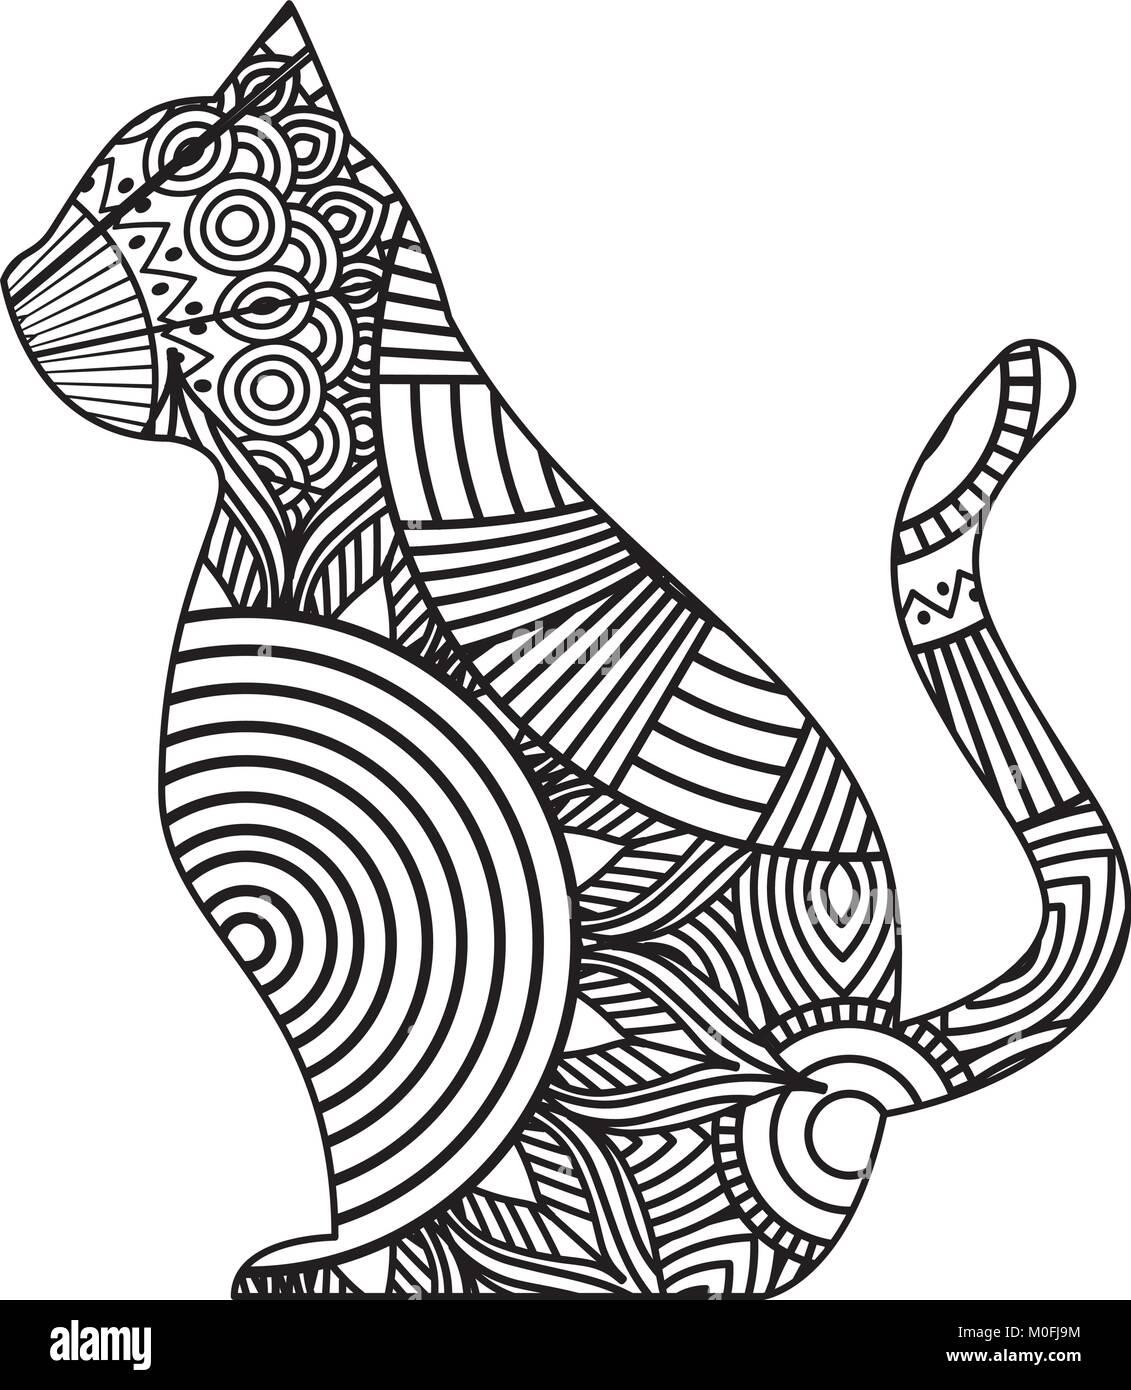 Sitting Cat Hand Drawn Illustration Imágenes De Stock & Sitting Cat ...